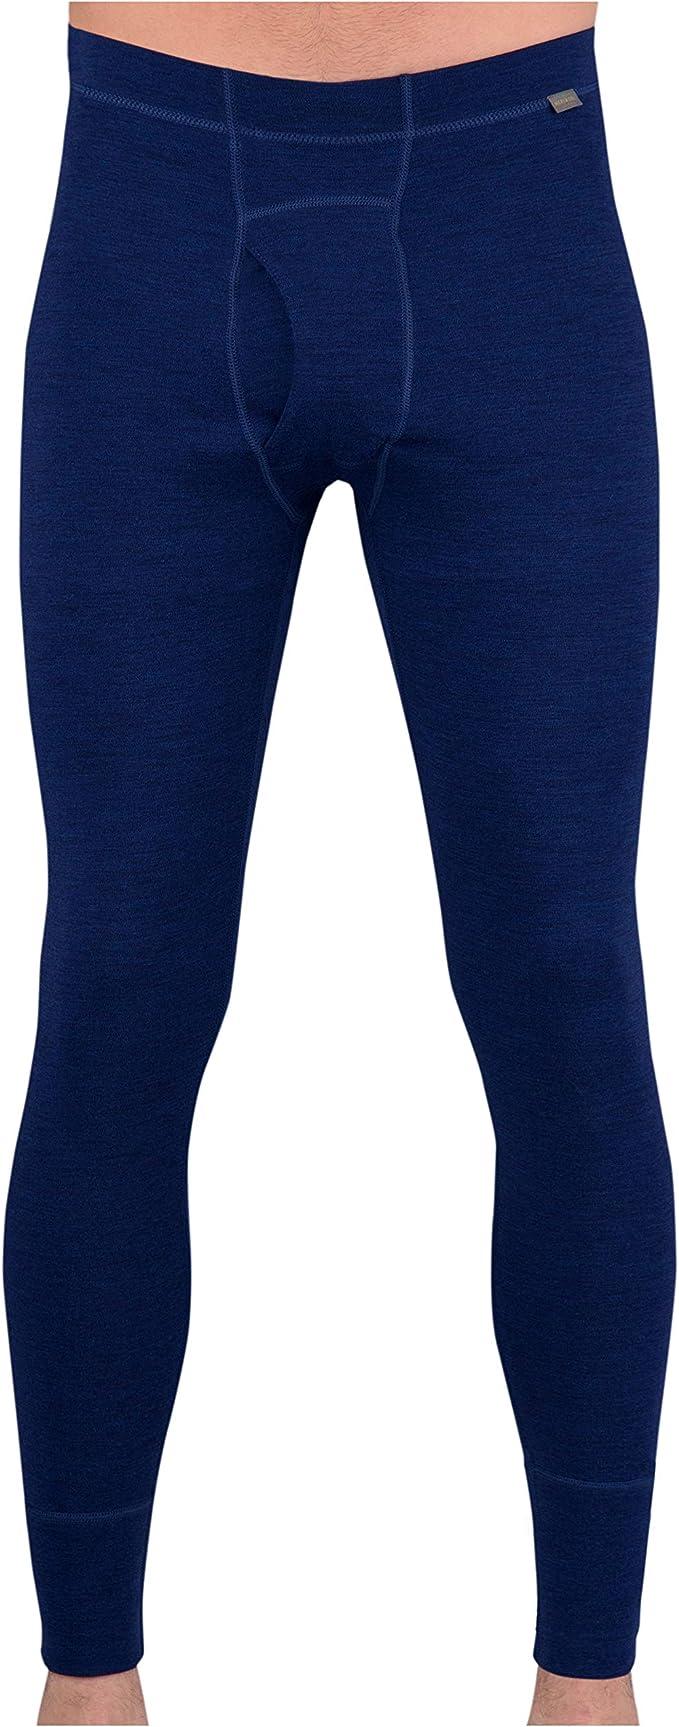 MERIWOOL Mens Base Layer Pants